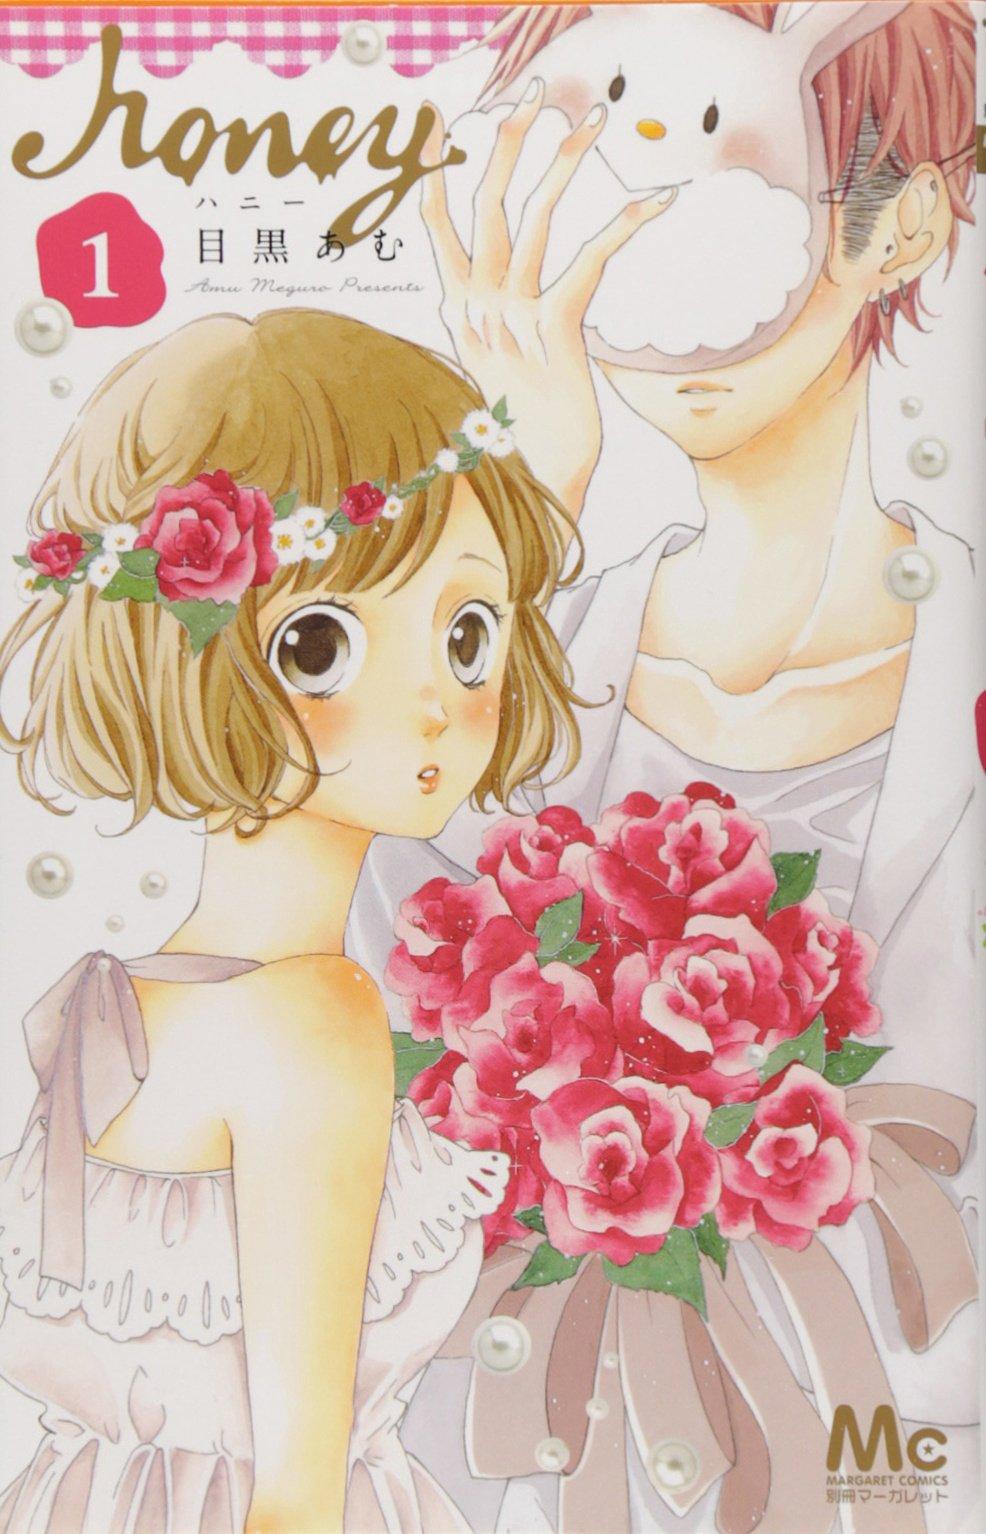 【Majiで恋するおすすめ恋愛漫画】2016年も胸キュン必至の最強14作品